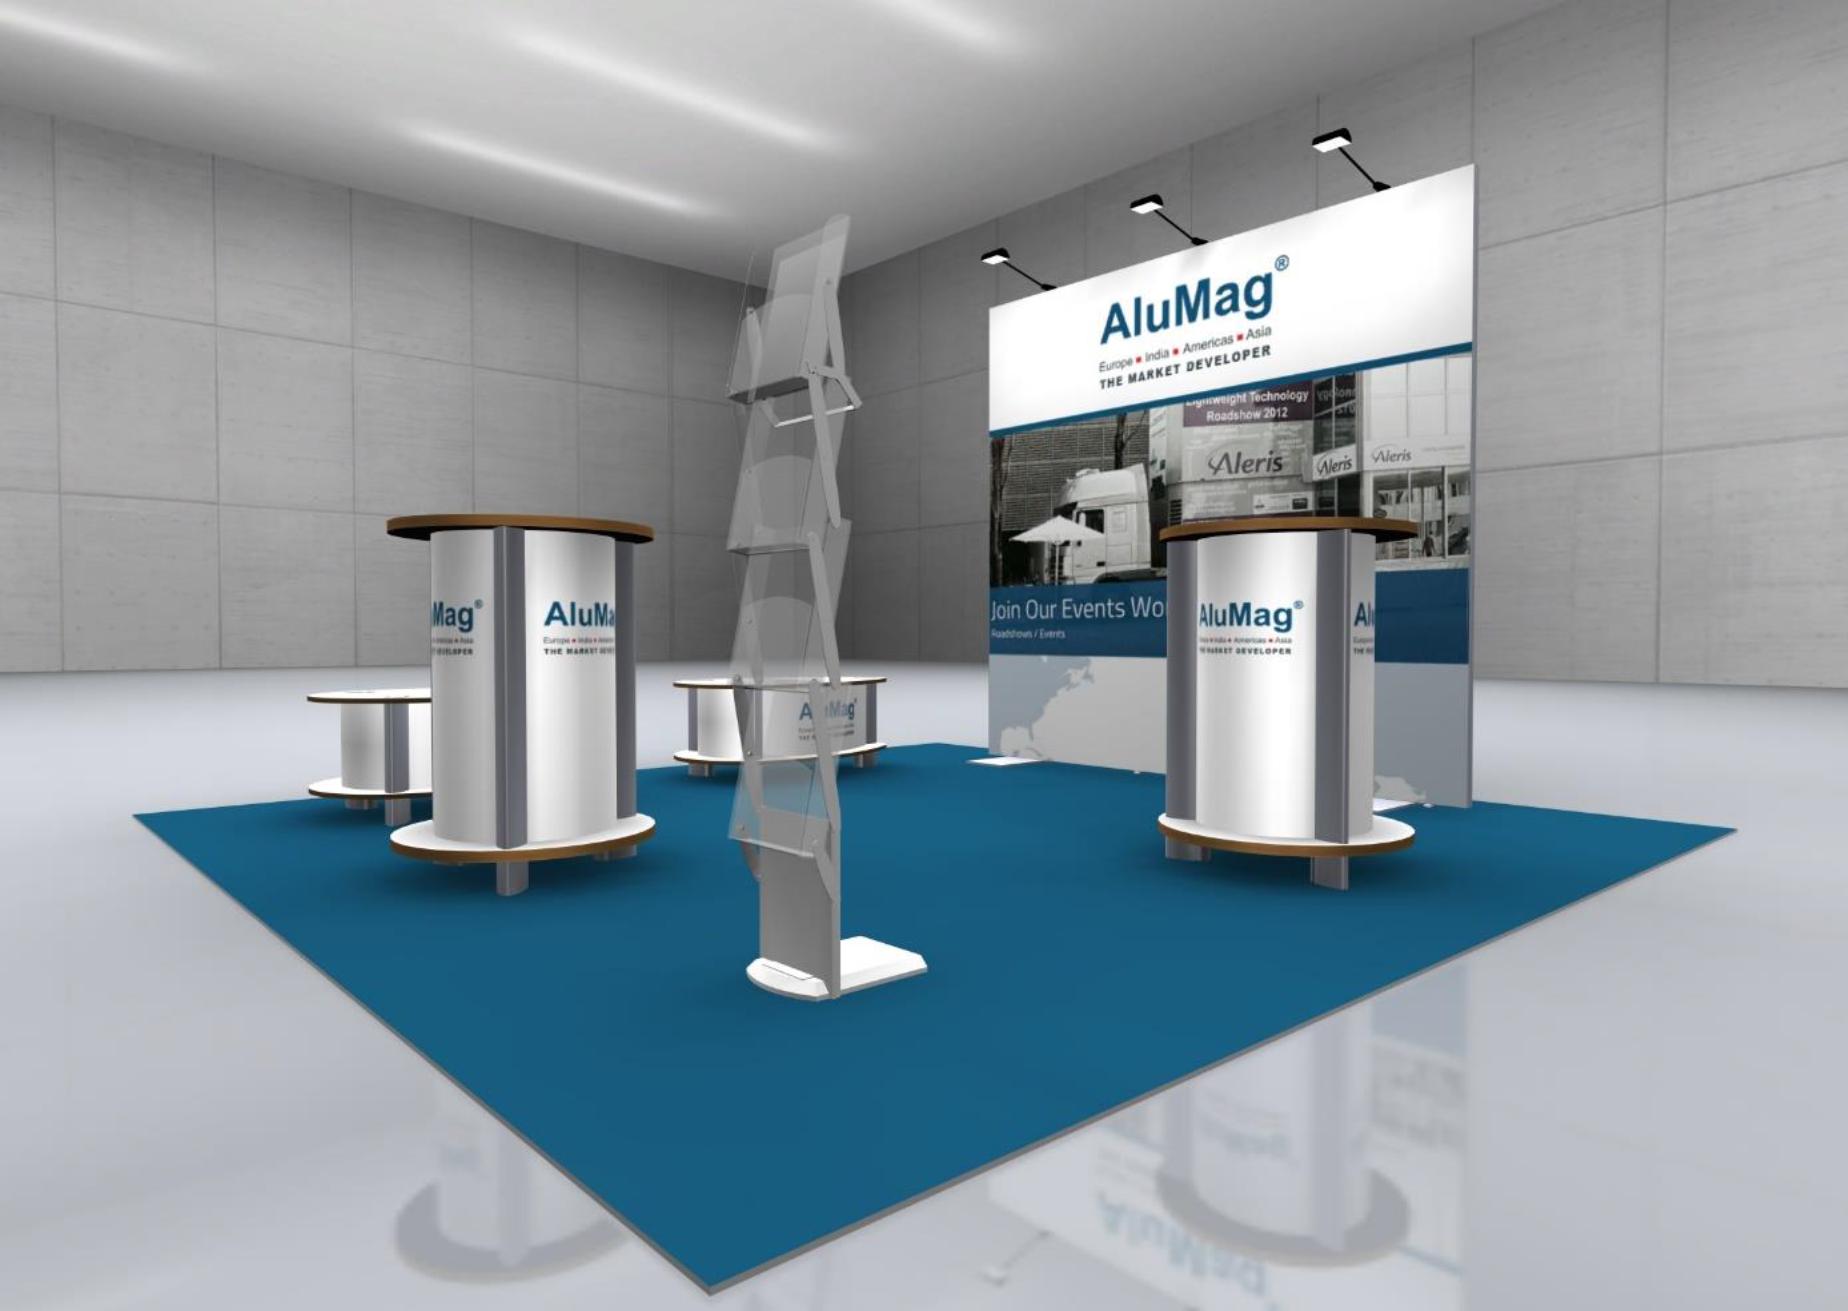 Symposium AluMag Booth System Concept II 1